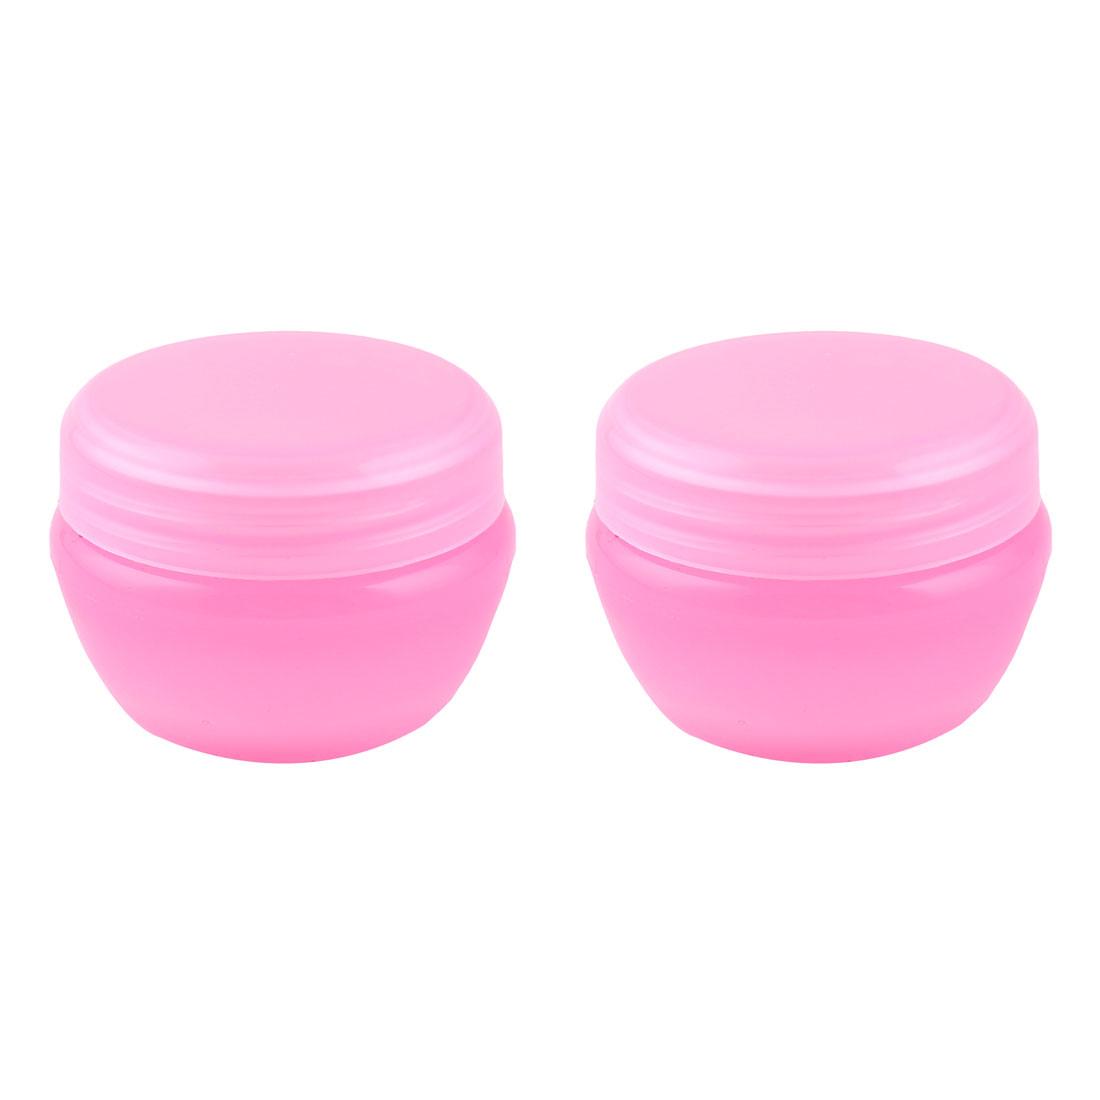 Travel Plastic Cream Container Cosmetic Storage Bottle Organizer Pink 25ml 2pcs